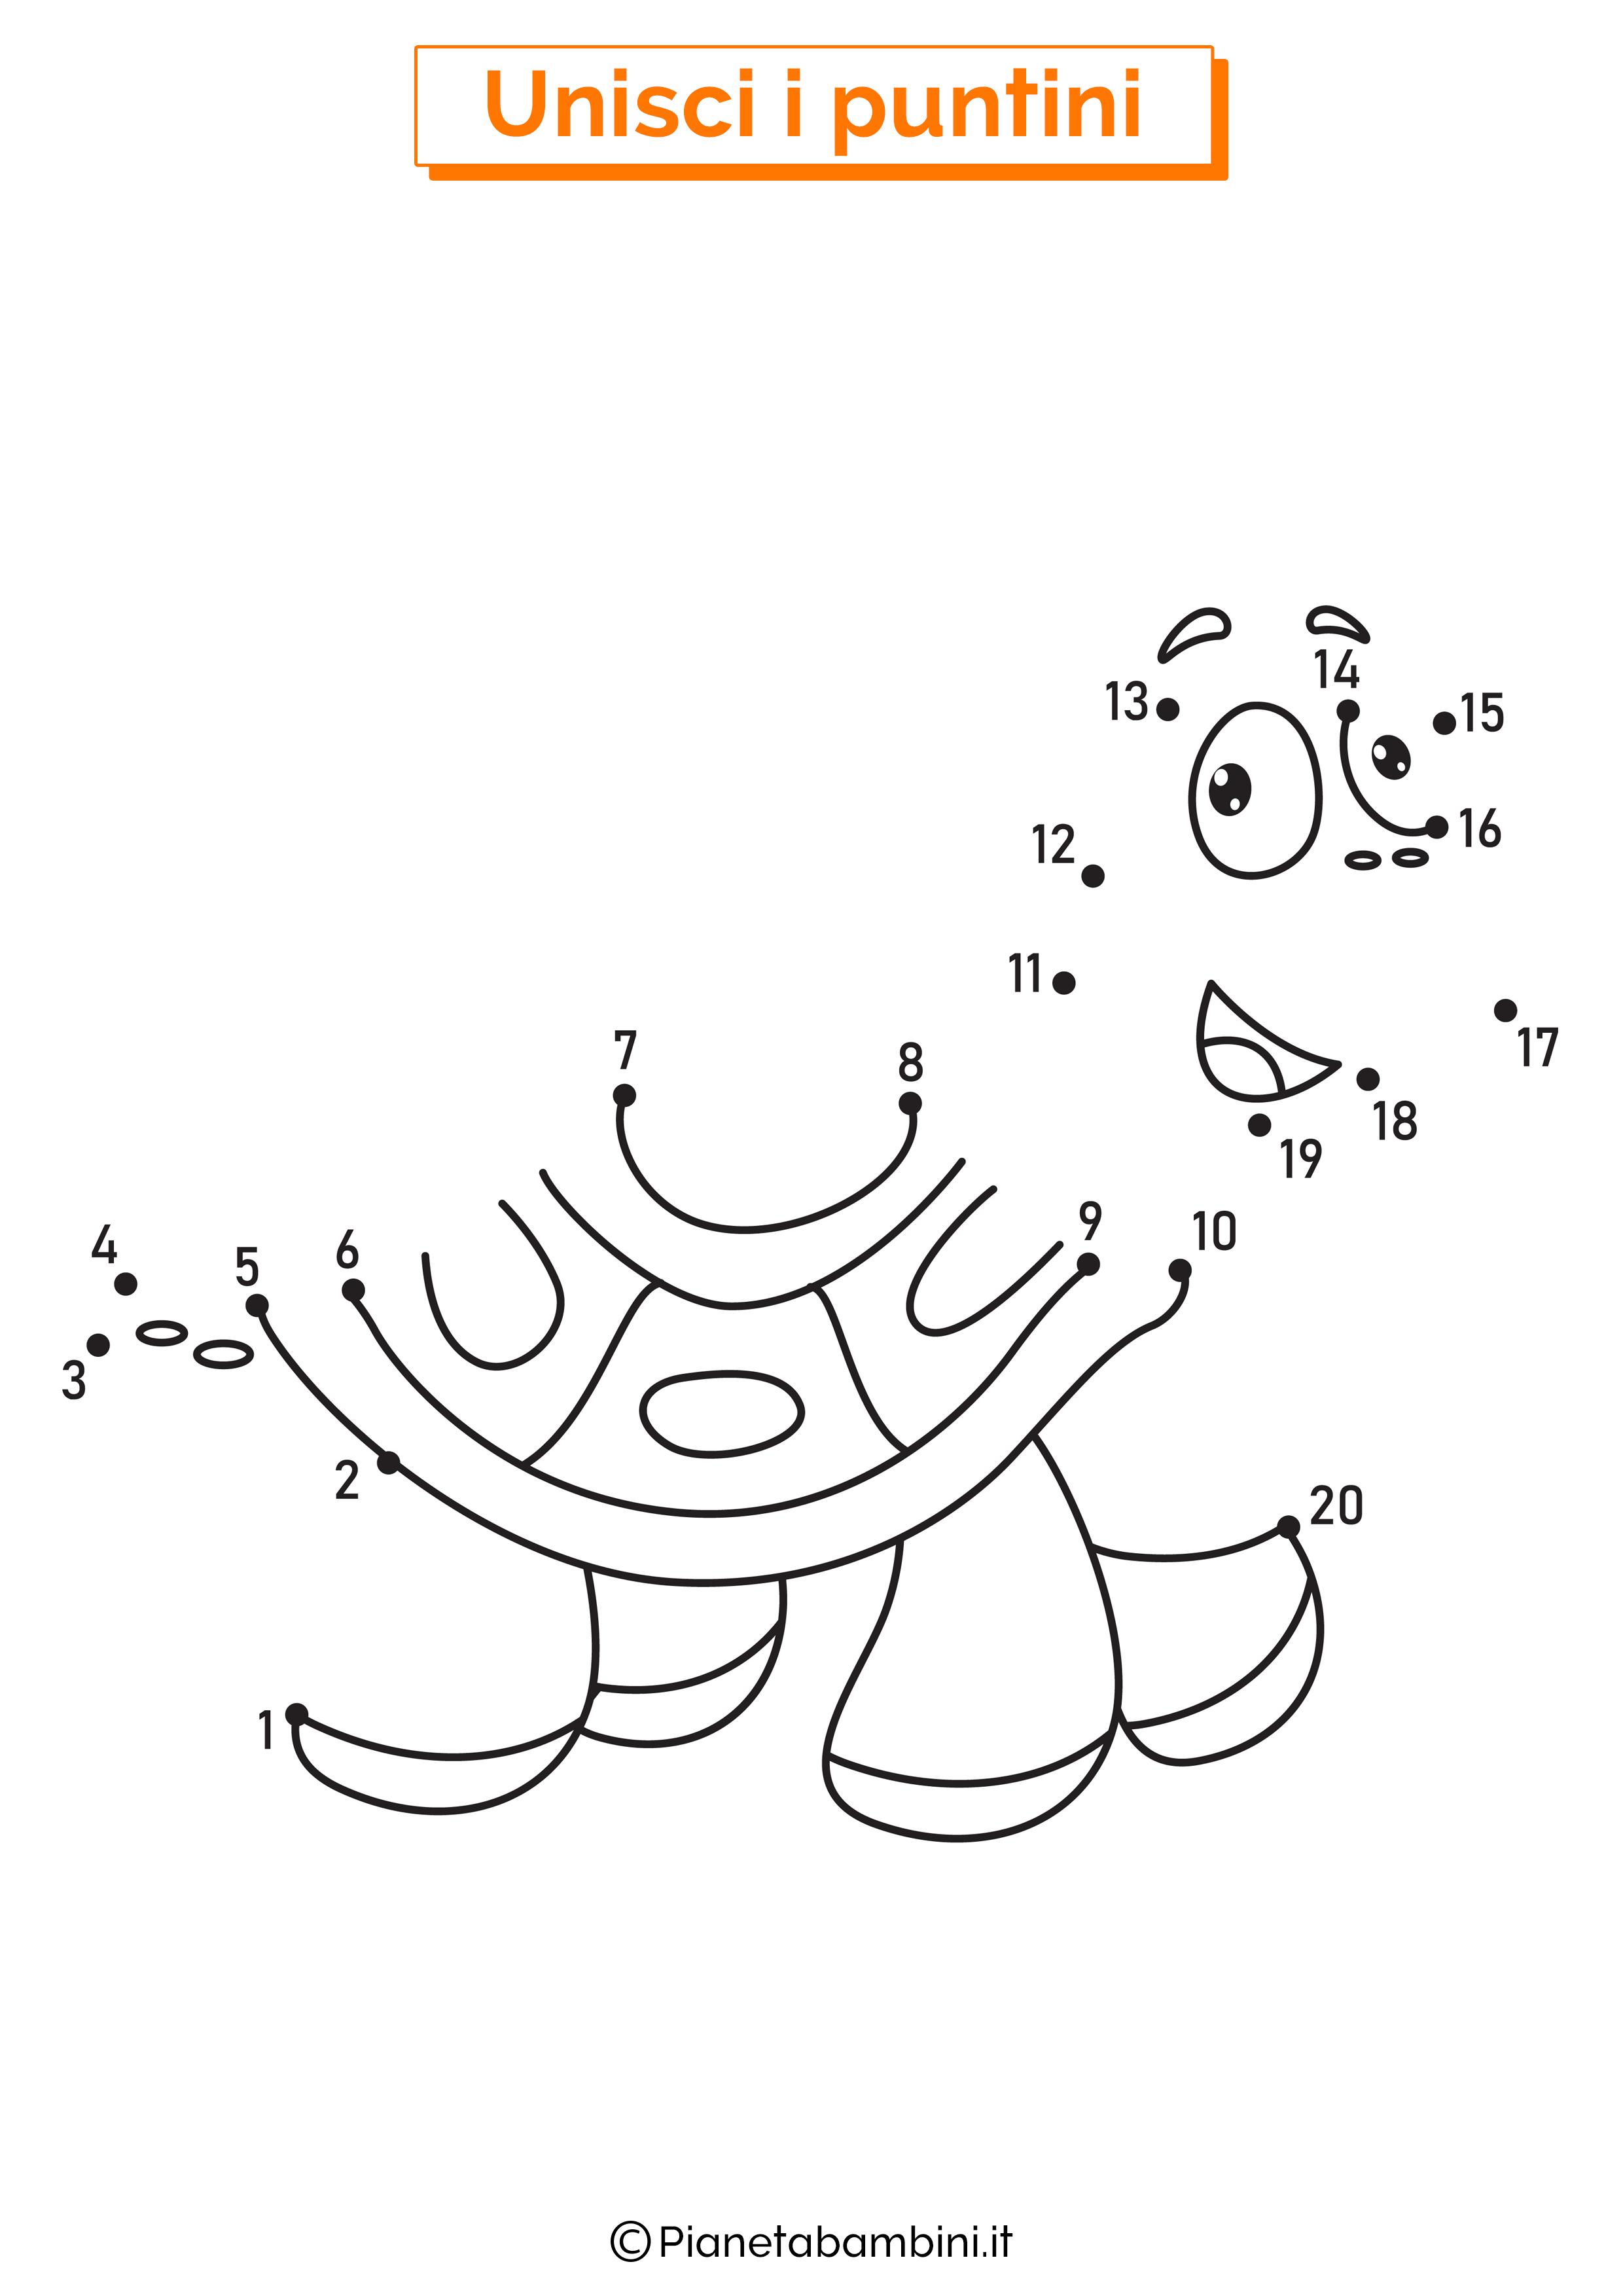 Disegno unisci i puntini tartaruga